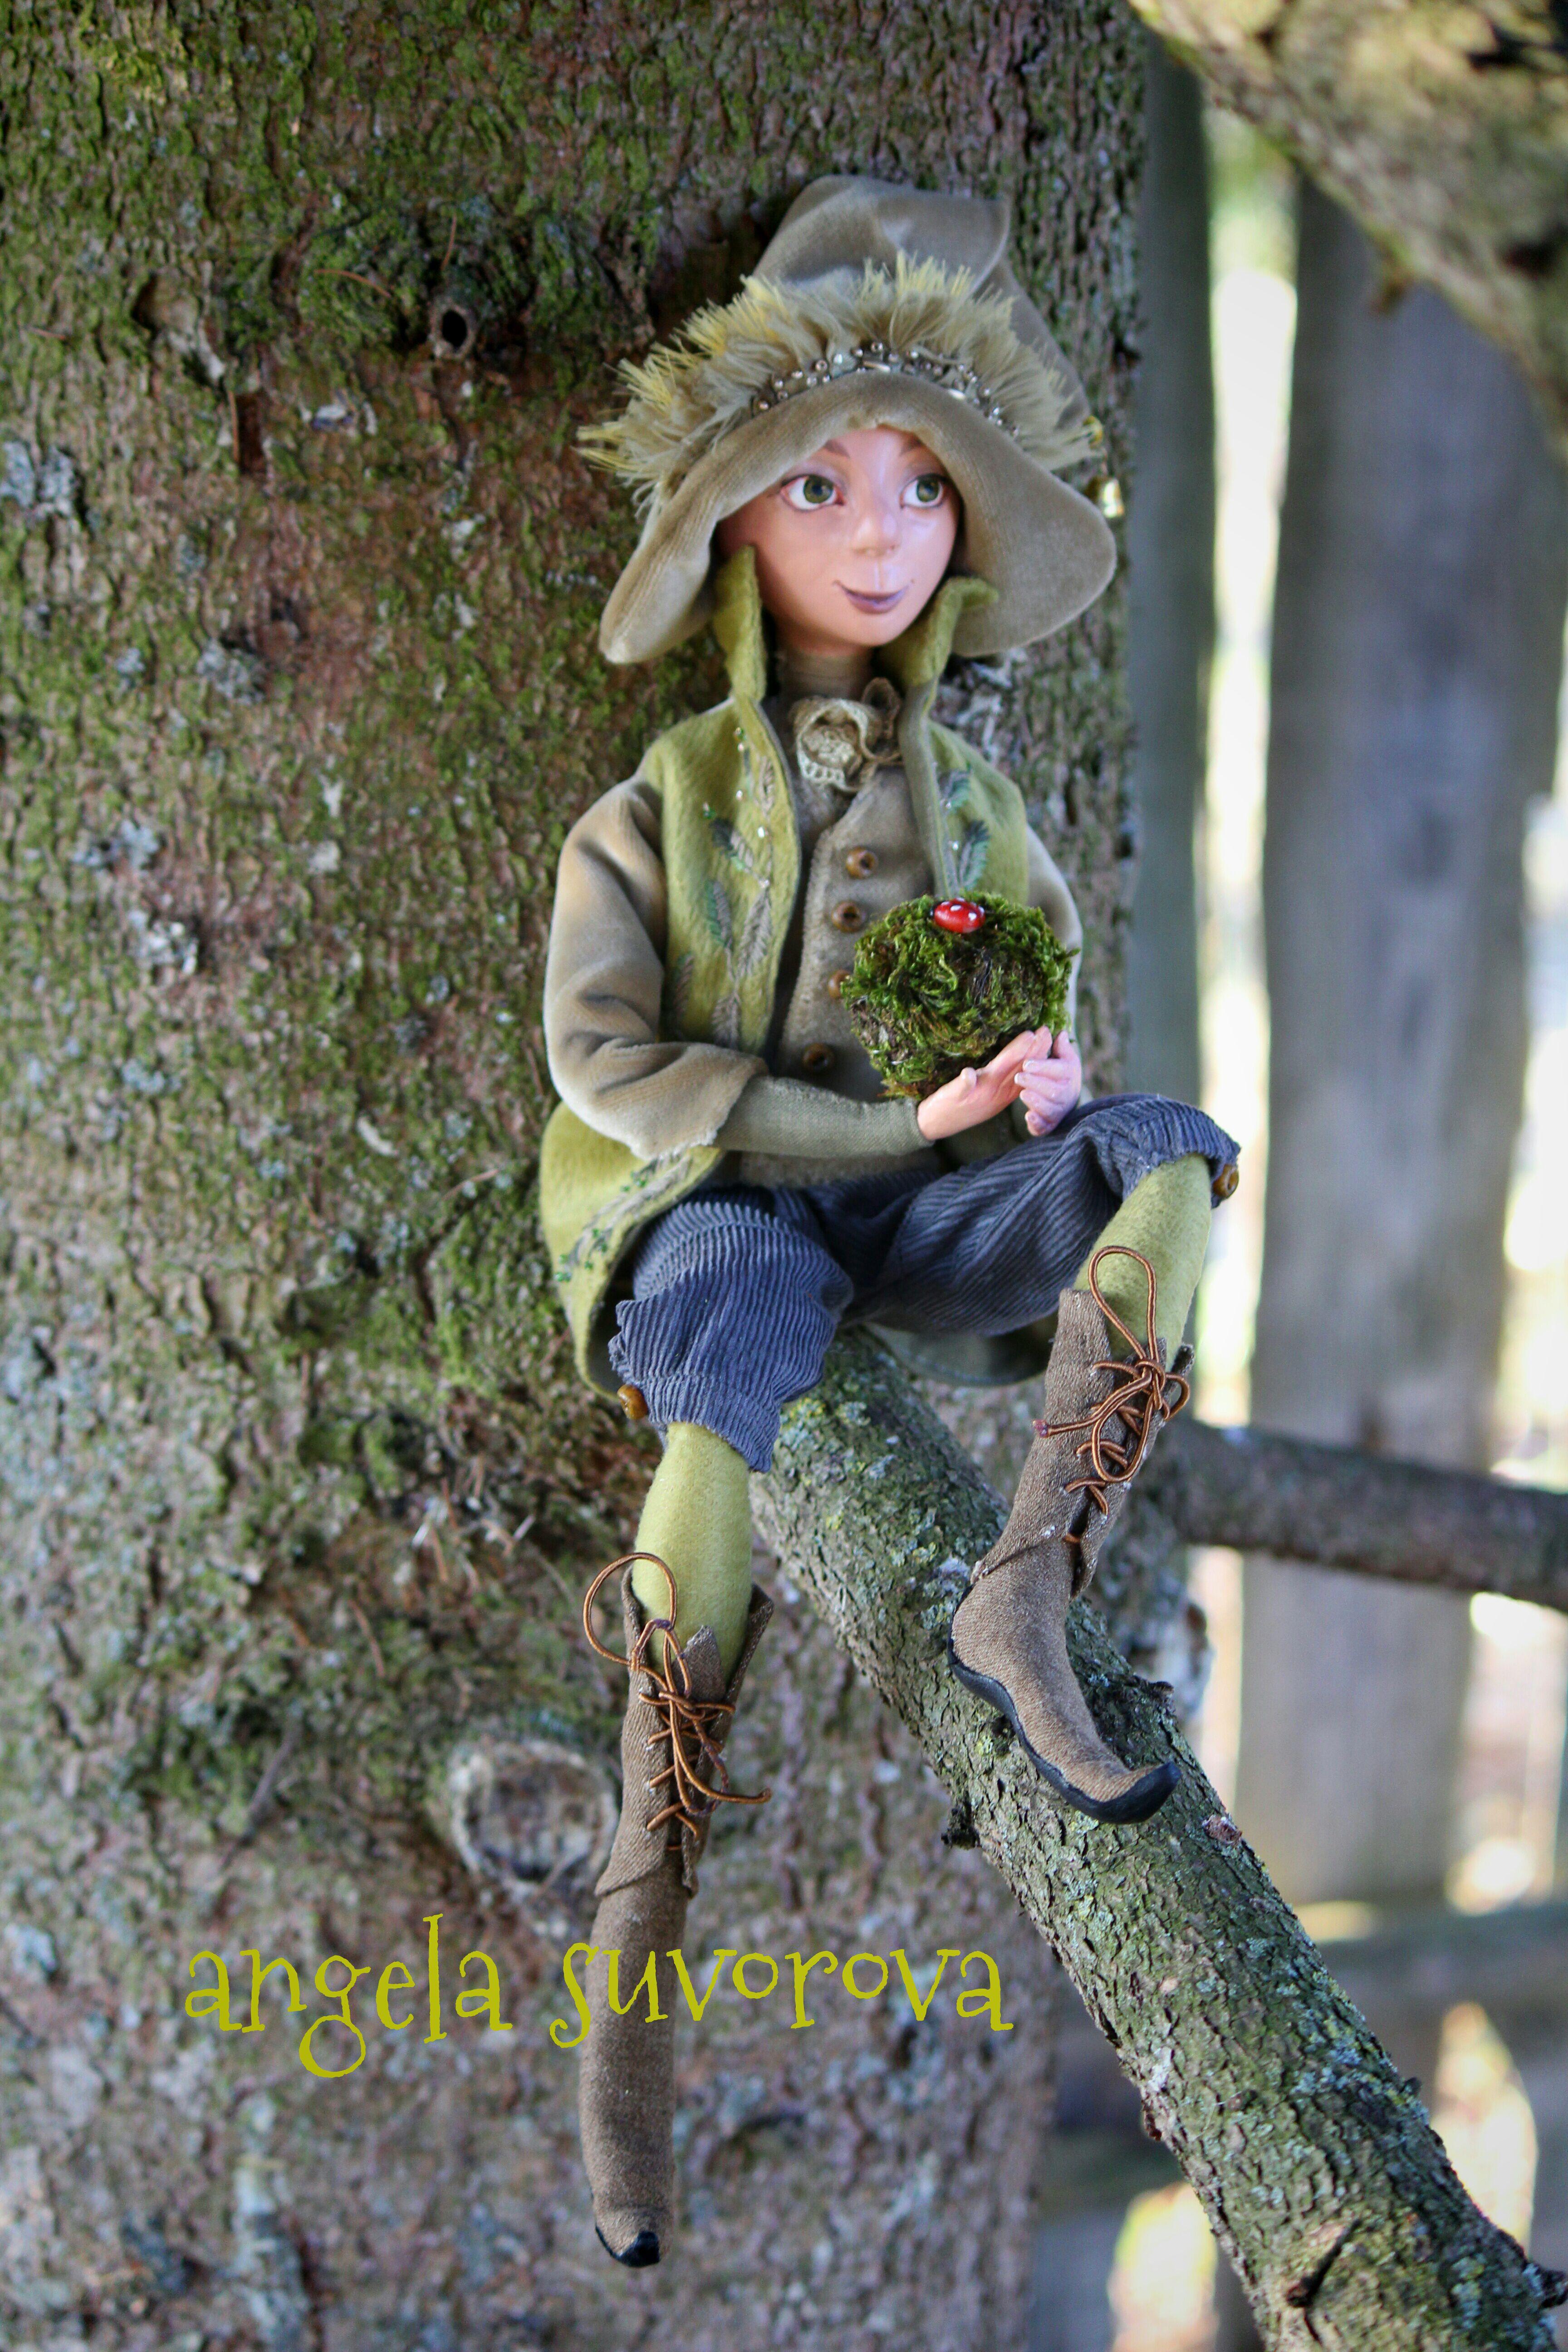 doll кукла aвторскаякукла сувенир куклавподарок авторскаякукла